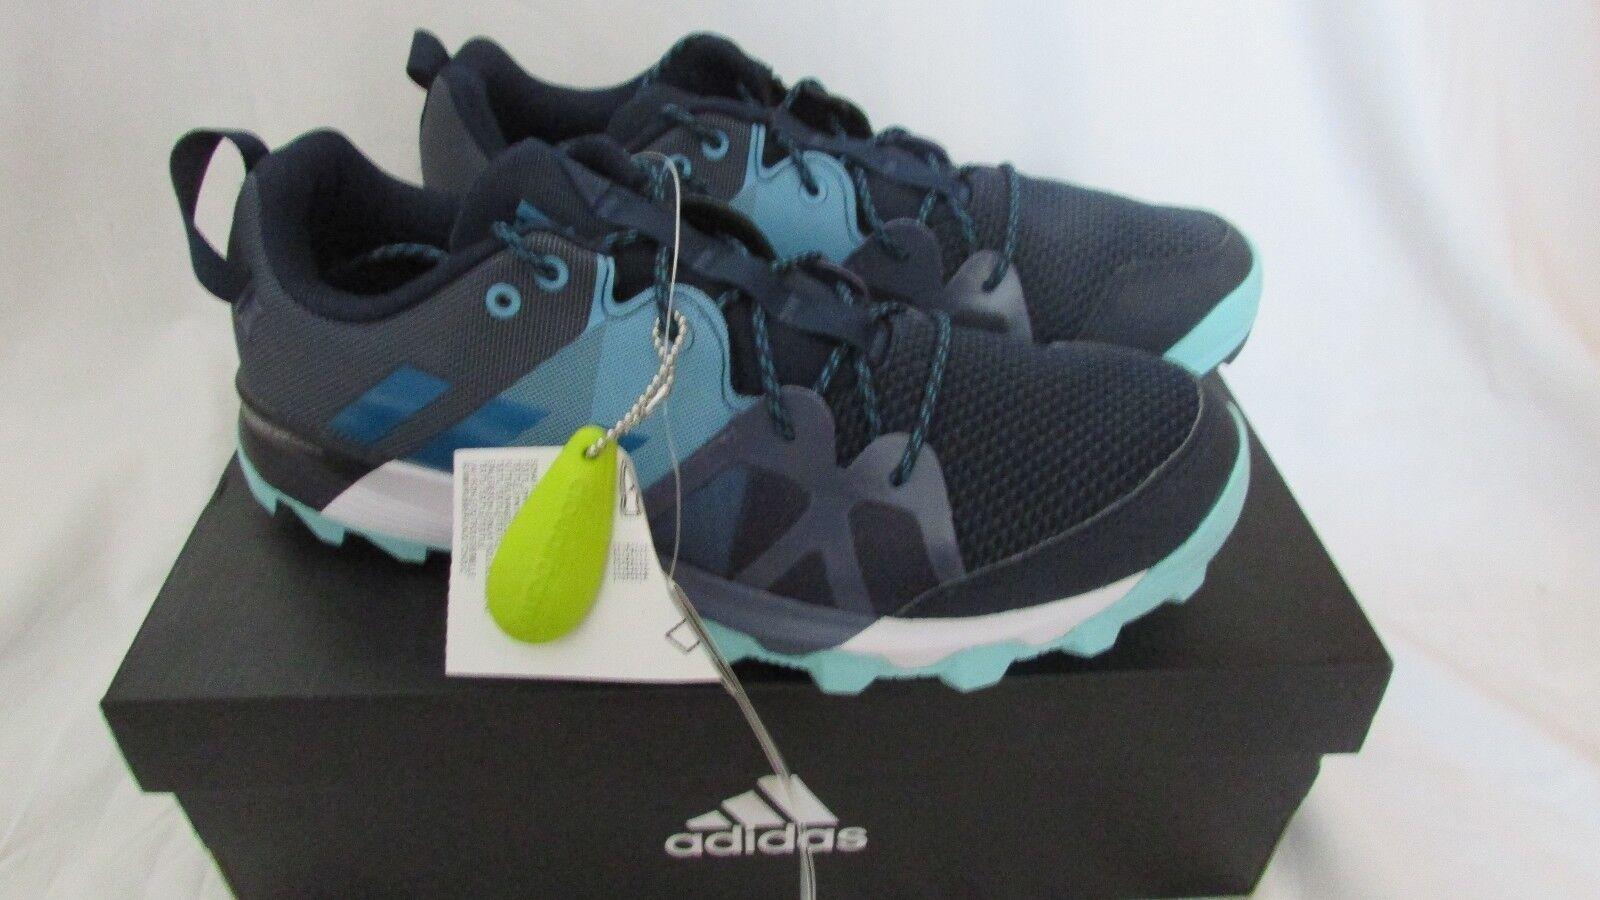 adidas kanadia 8.1 trail tr Damenschuhe Running Schuhes Sports Trainers Blau Größe 4.5